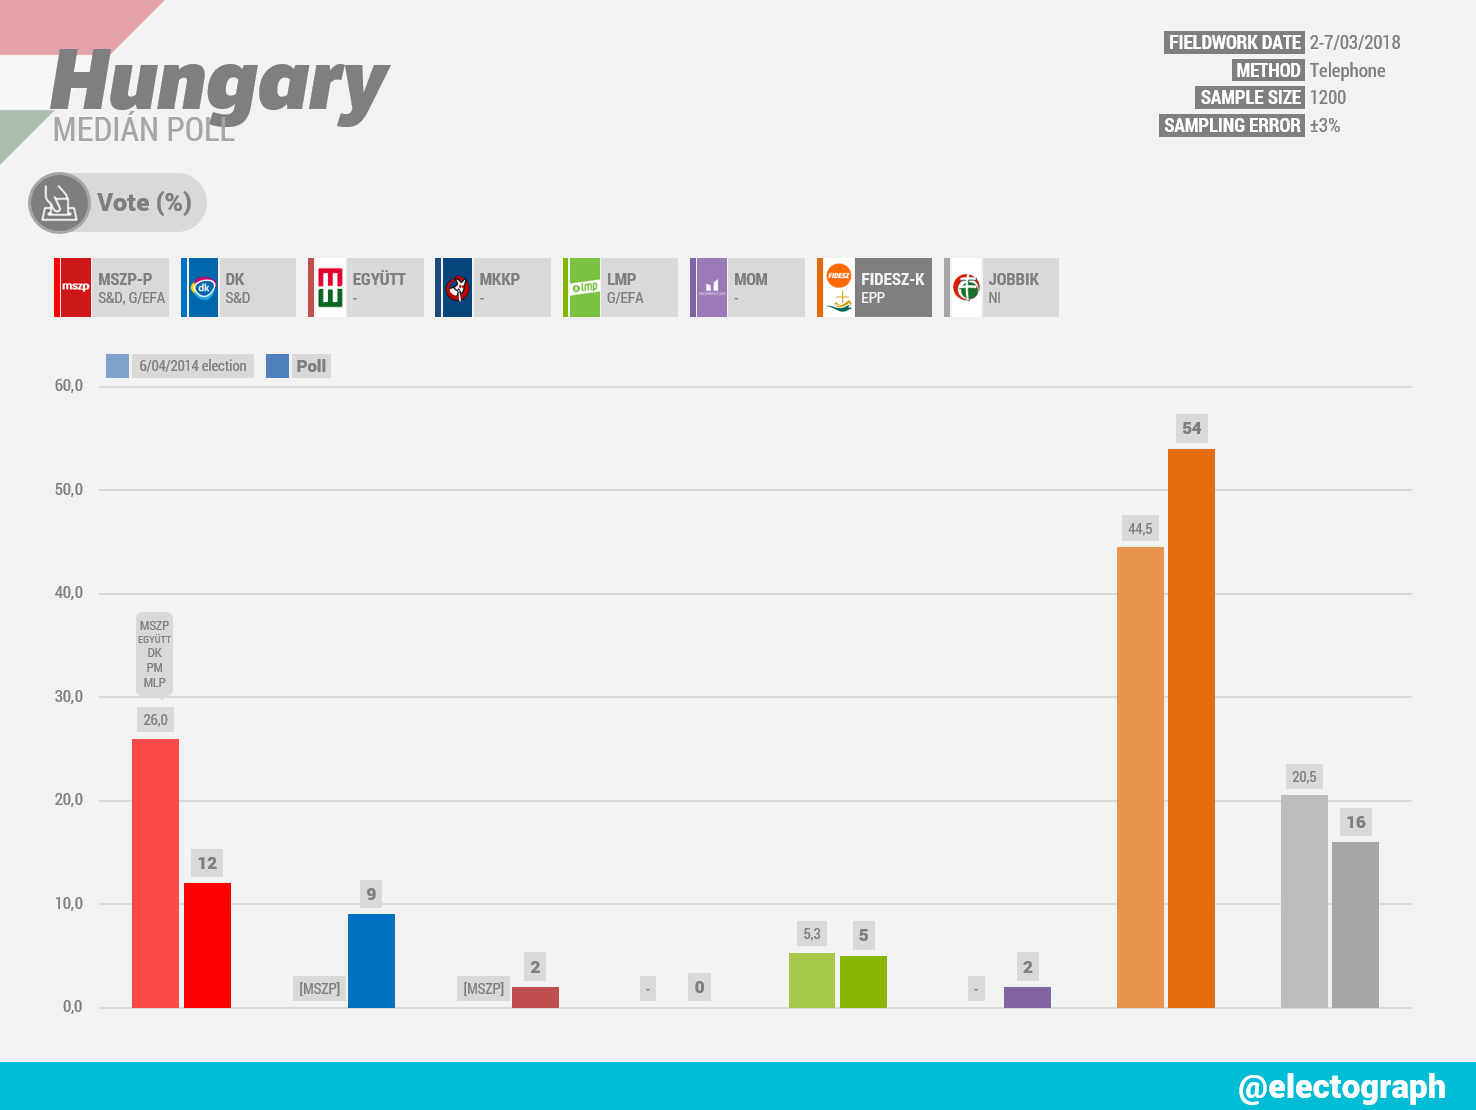 HUNGARY Medián poll, March 2018